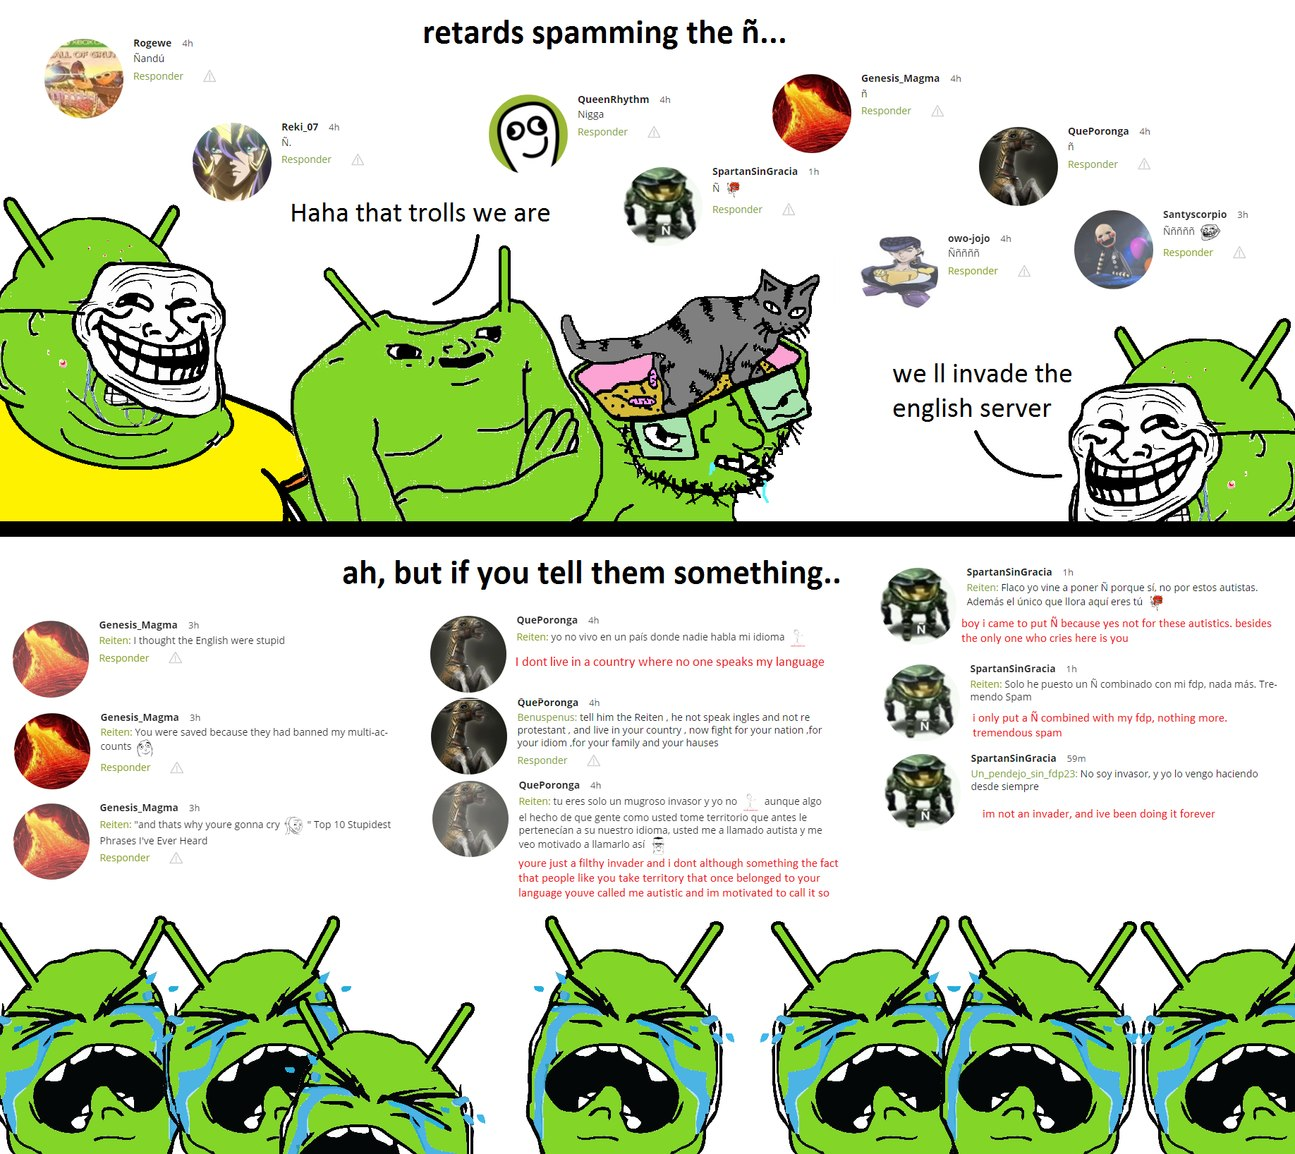 trollodroiders crying, again - meme